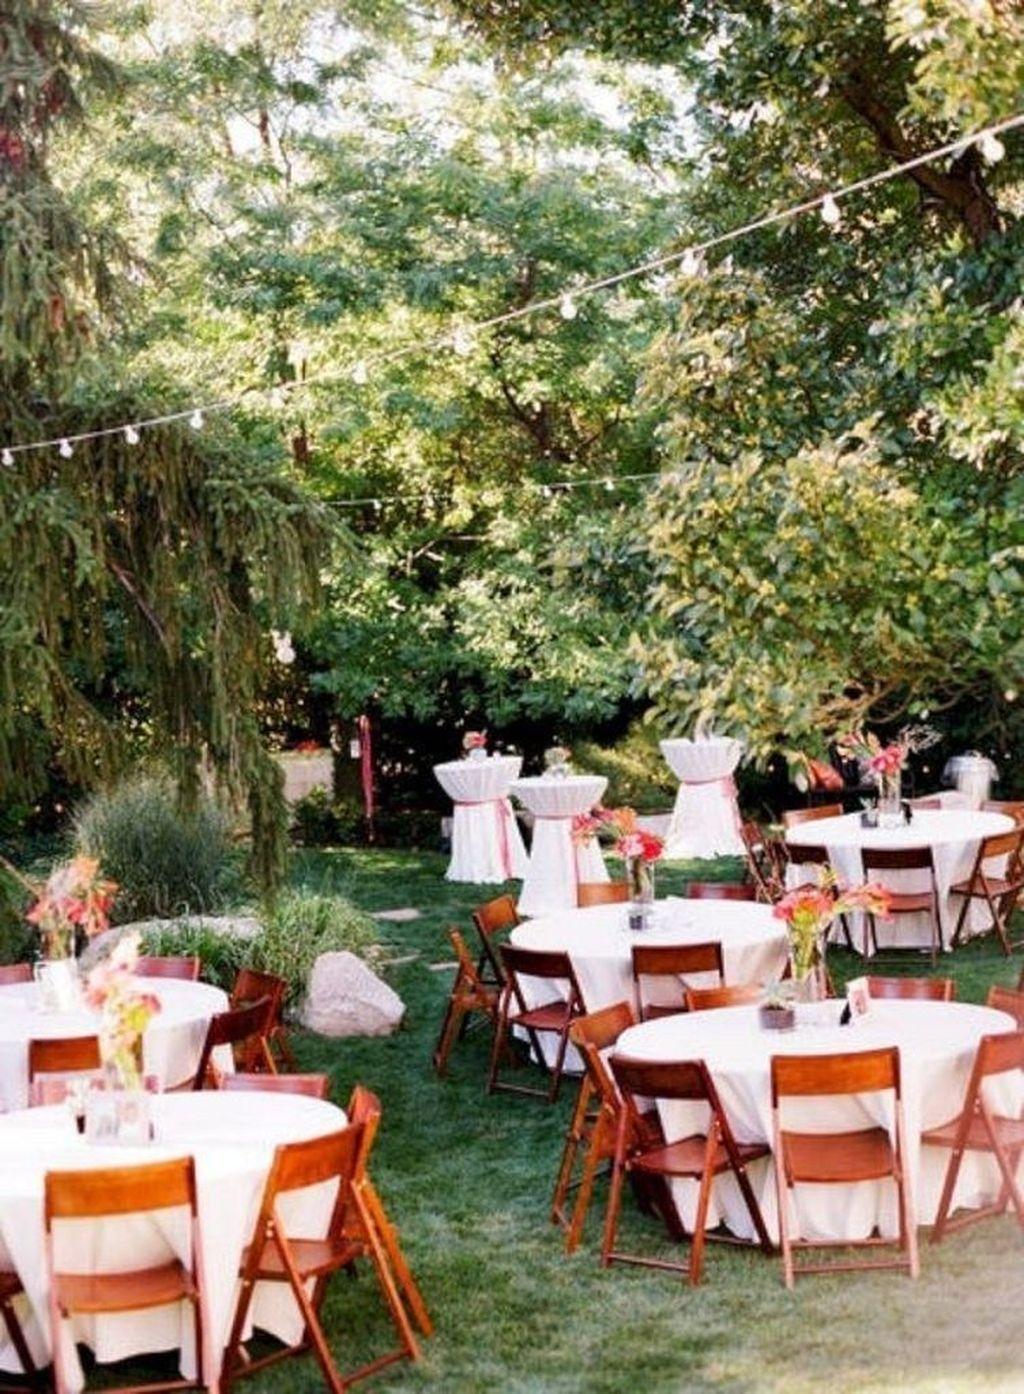 Fabulous Fall Backyard Party Decorations Ideas 04